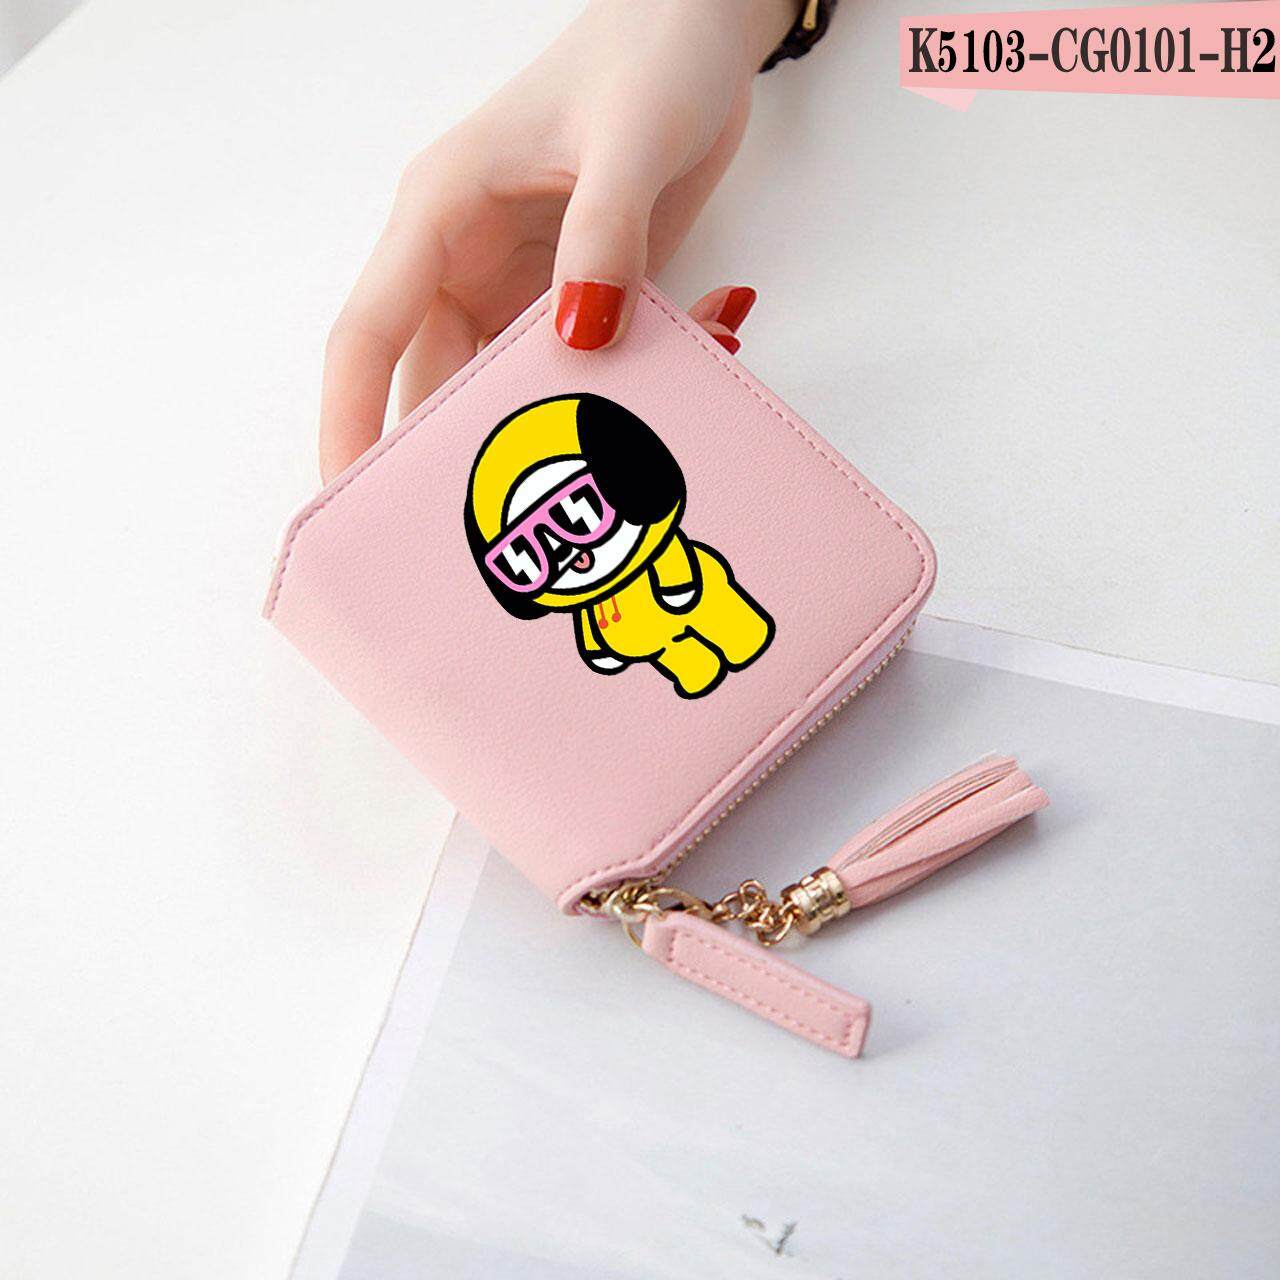 BTS Accessories Women Wallets Zipper Card Girl Kpop Wallets Purses Mini Bags Bangtan Boy Tassel Coin Pocket